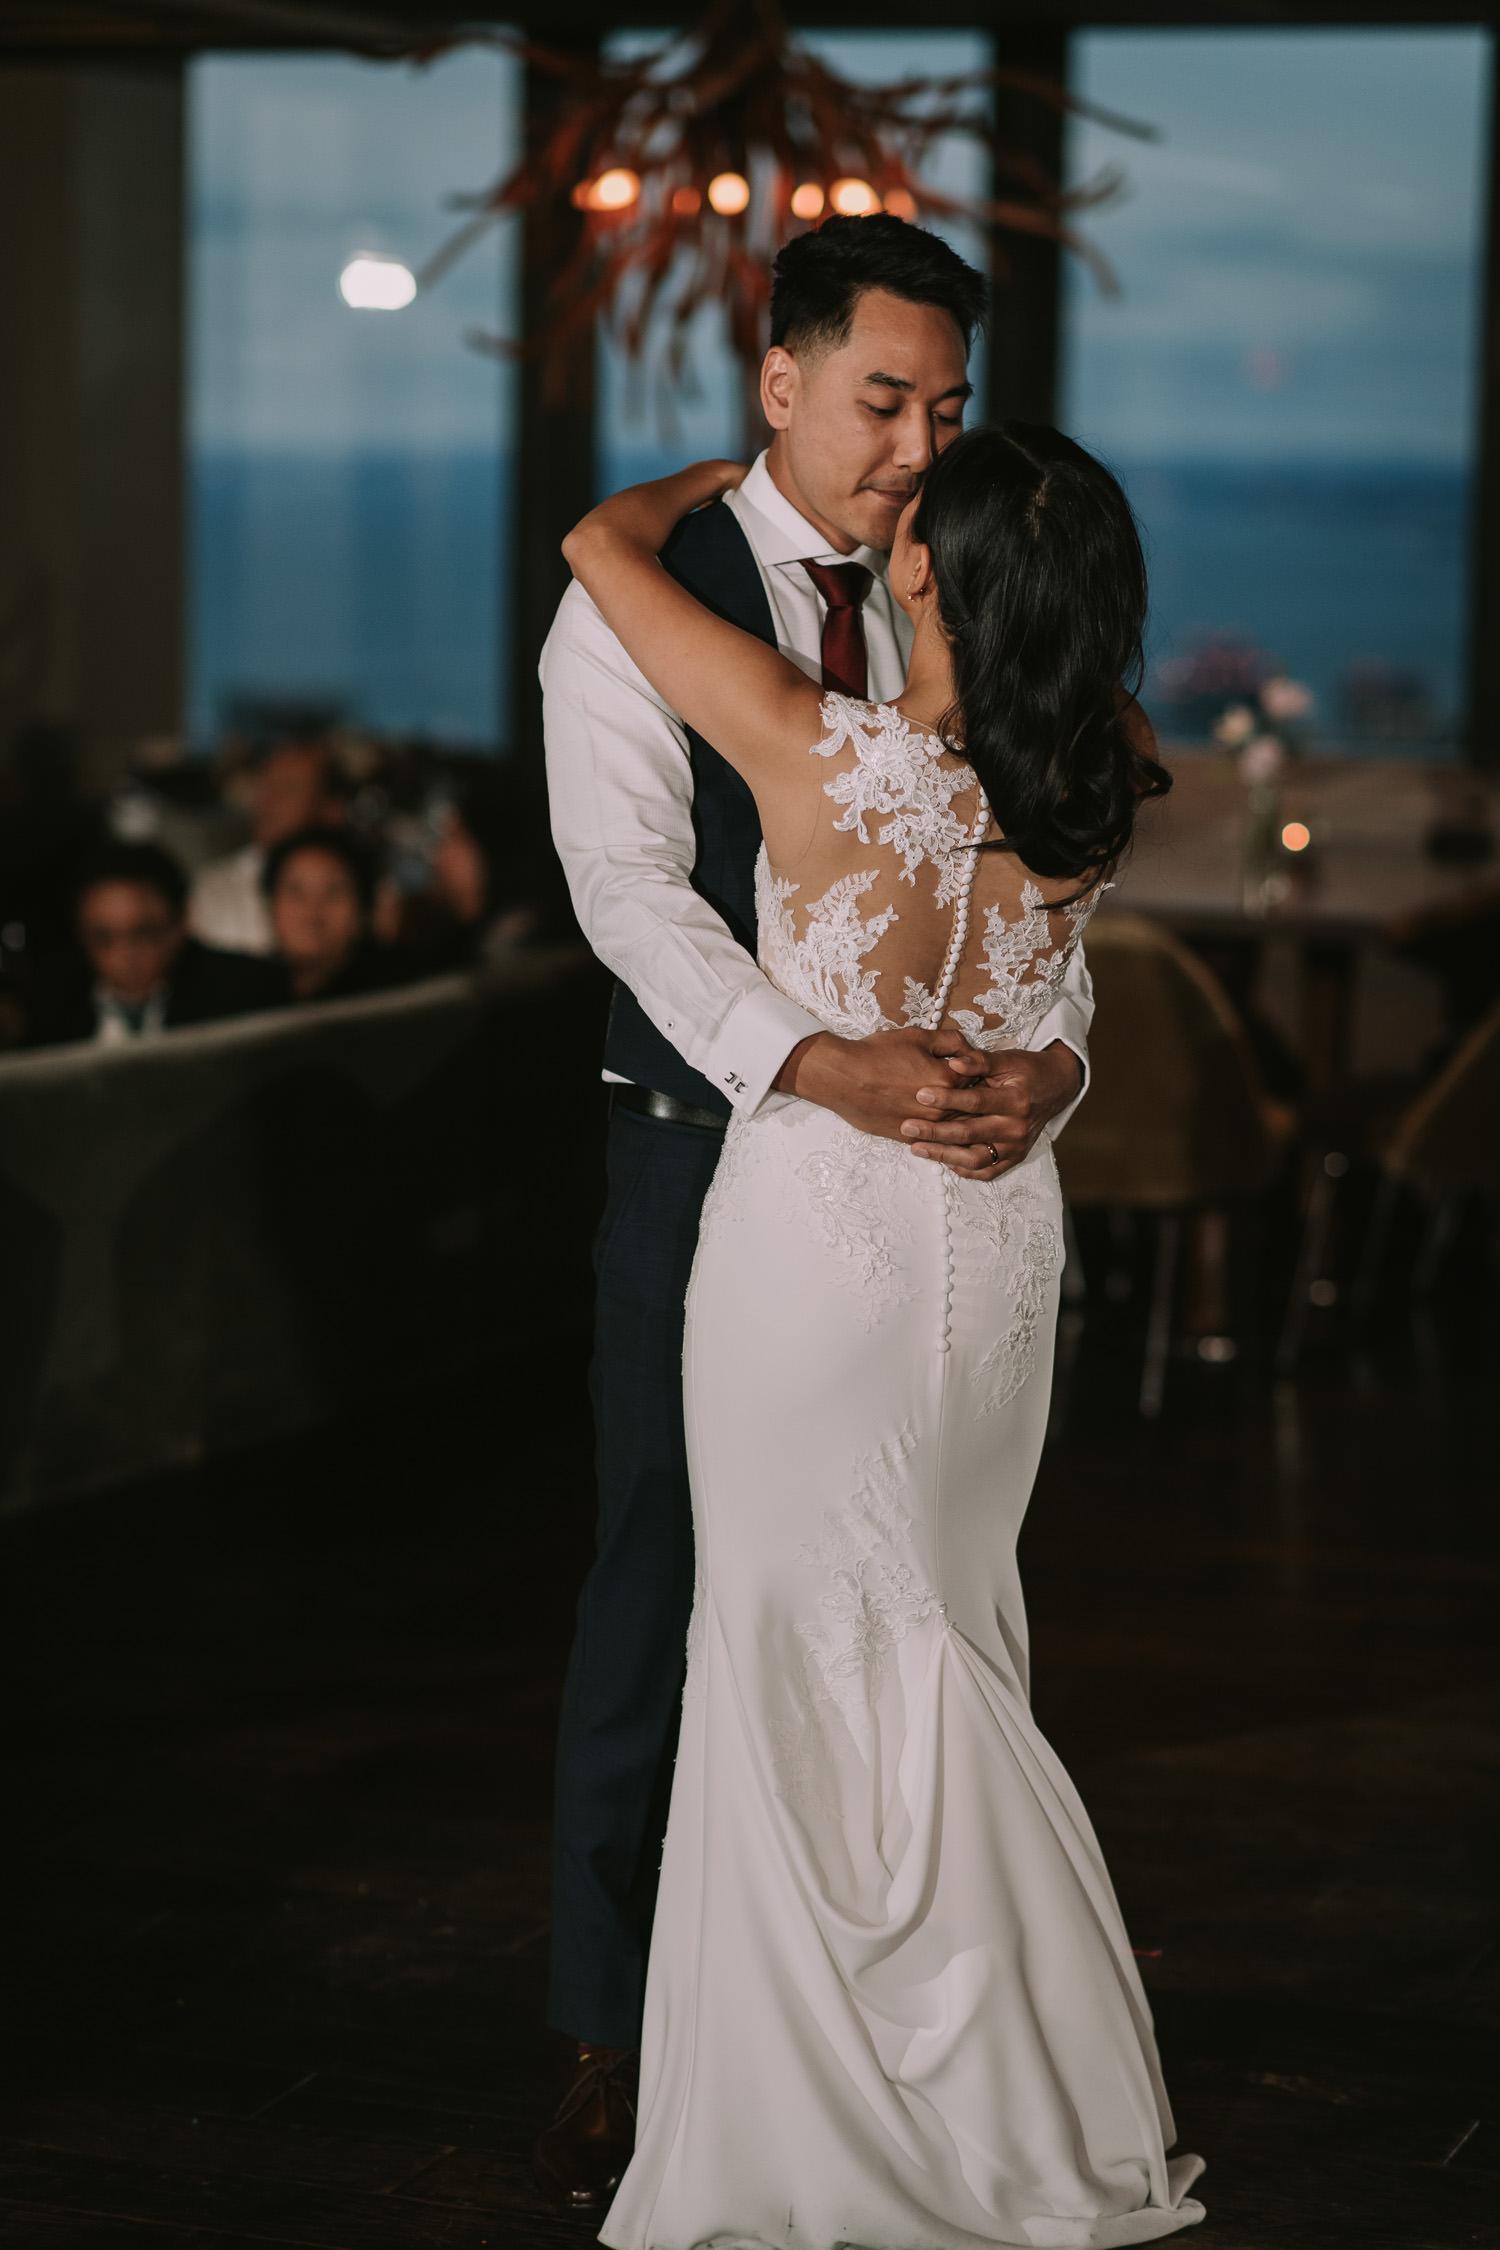 Canoe Restaurant Wedding First Dance